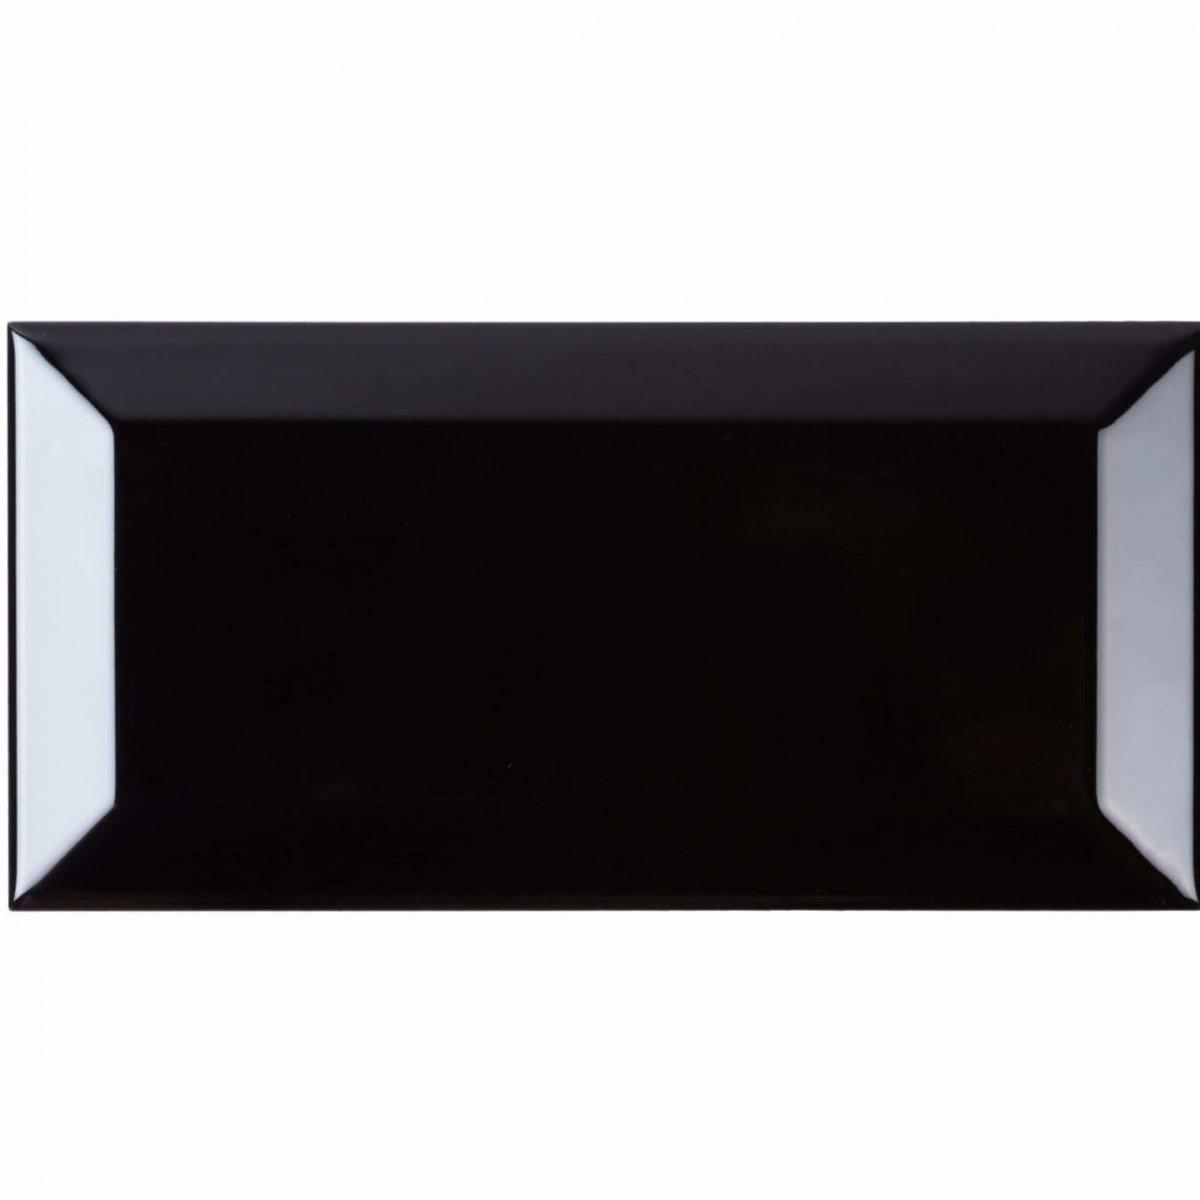 CRS Black Biselado Brillo 100x200mm_Stiles_Product_Image